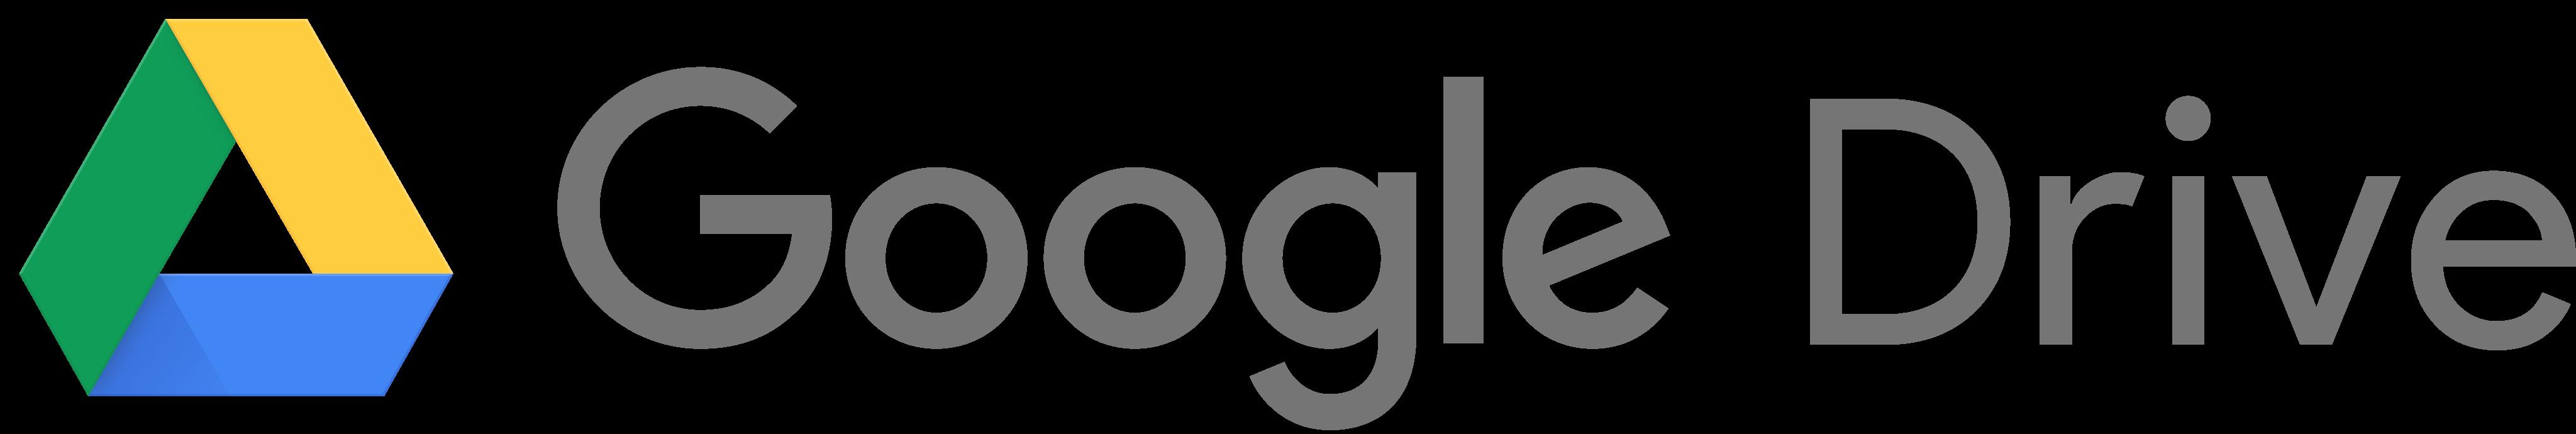 google drive logo - Google Drive Logo